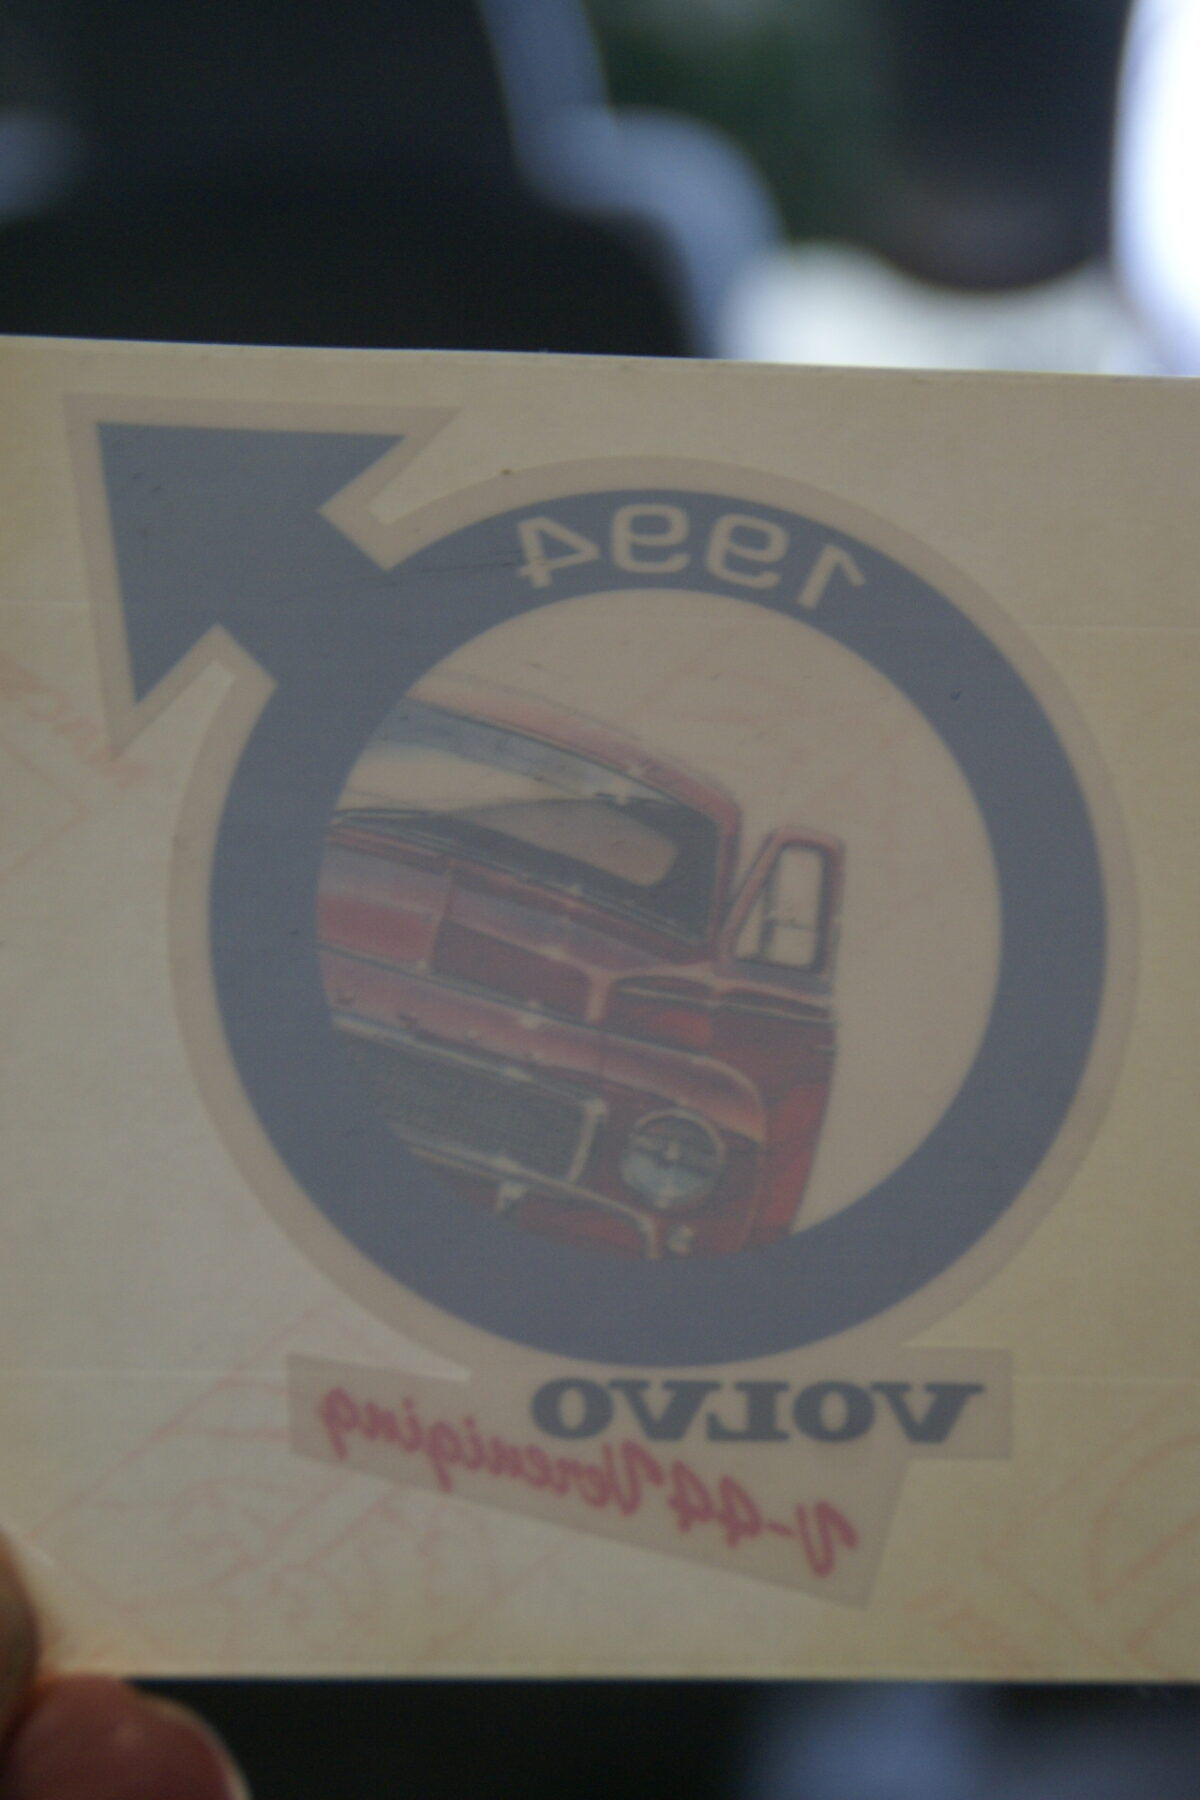 DSC02524 1994 sticker Volvo V44 Vereniging NOS-0fc4d129